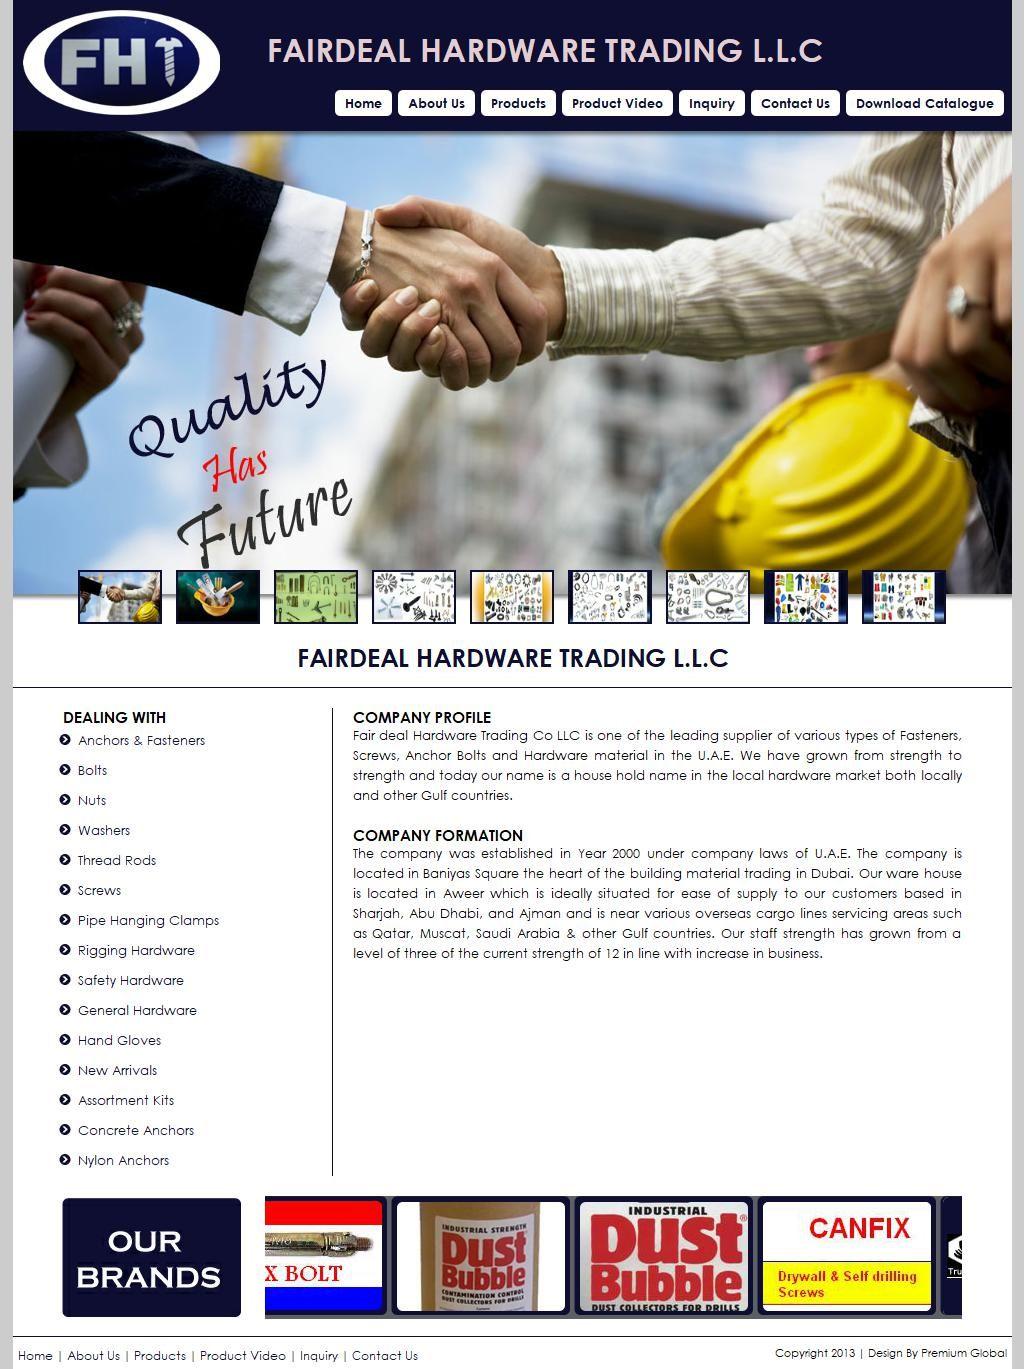 Fairdeal Hardware Trading, Llc Badri Building, 14, Sikka 36a